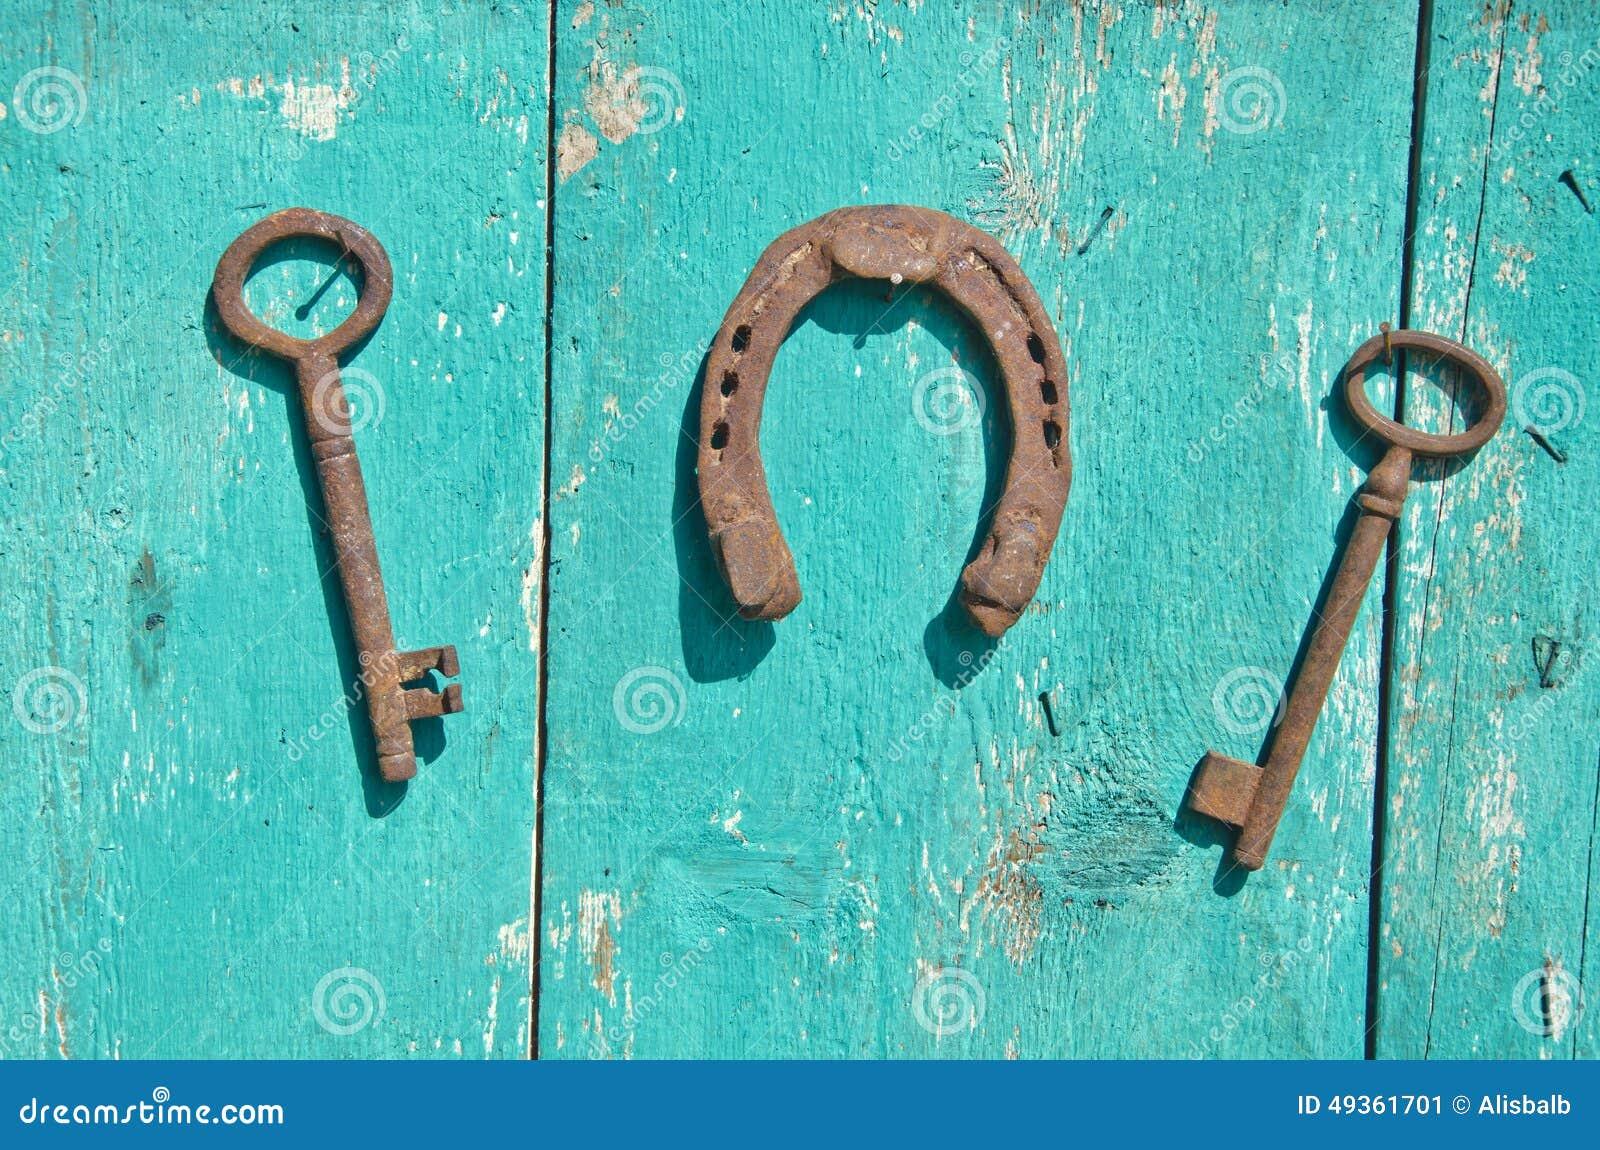 Oude roestige historische sleutel twee en geluksymboolhoef op muur